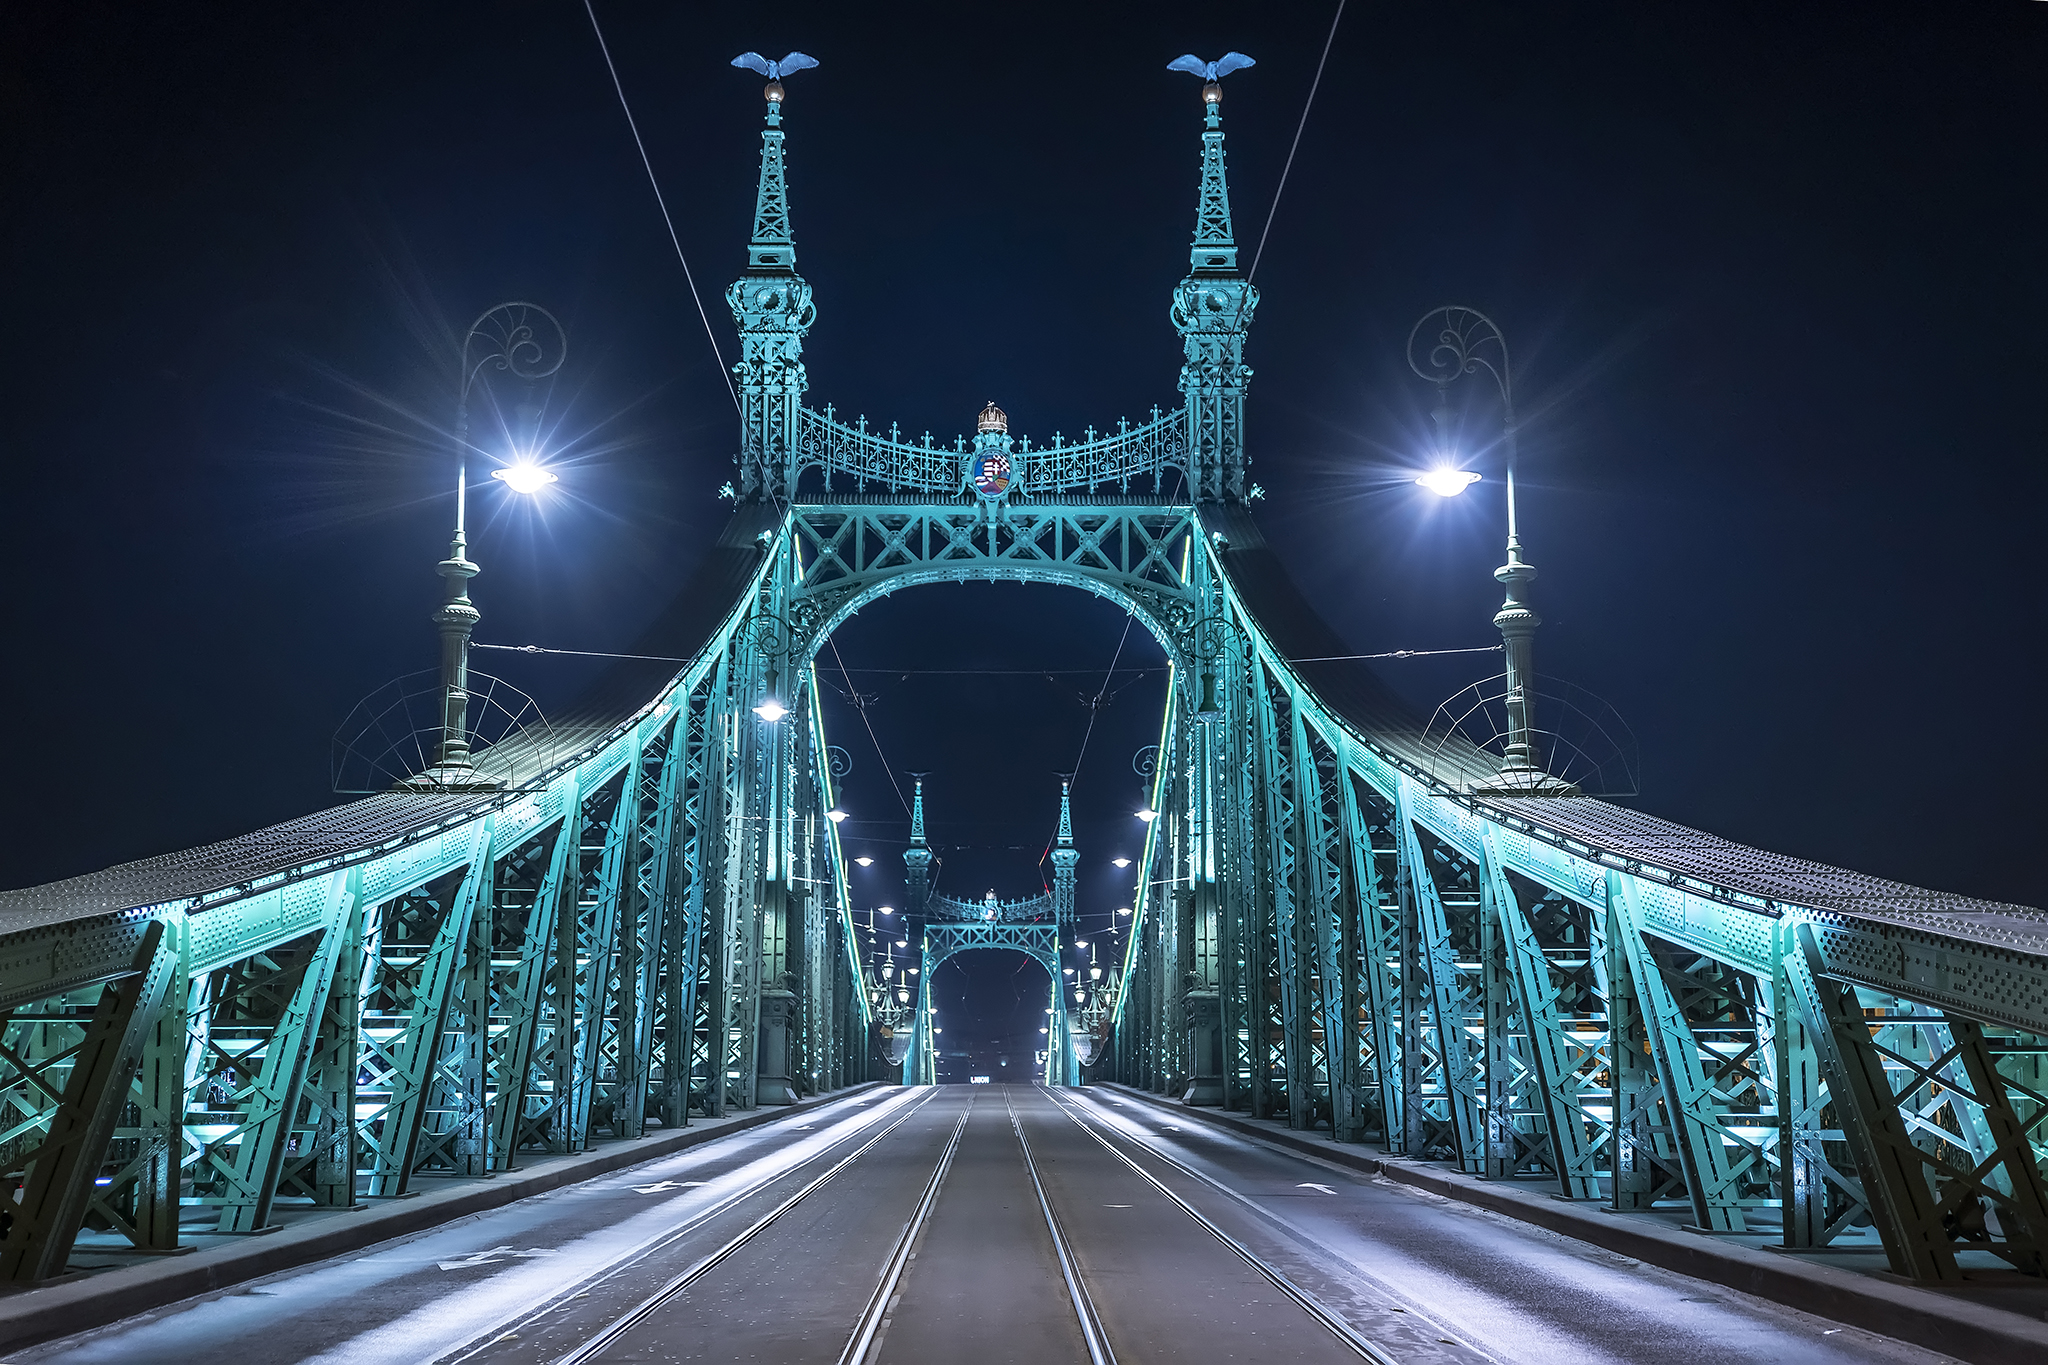 Liberty Bridge, Hungary